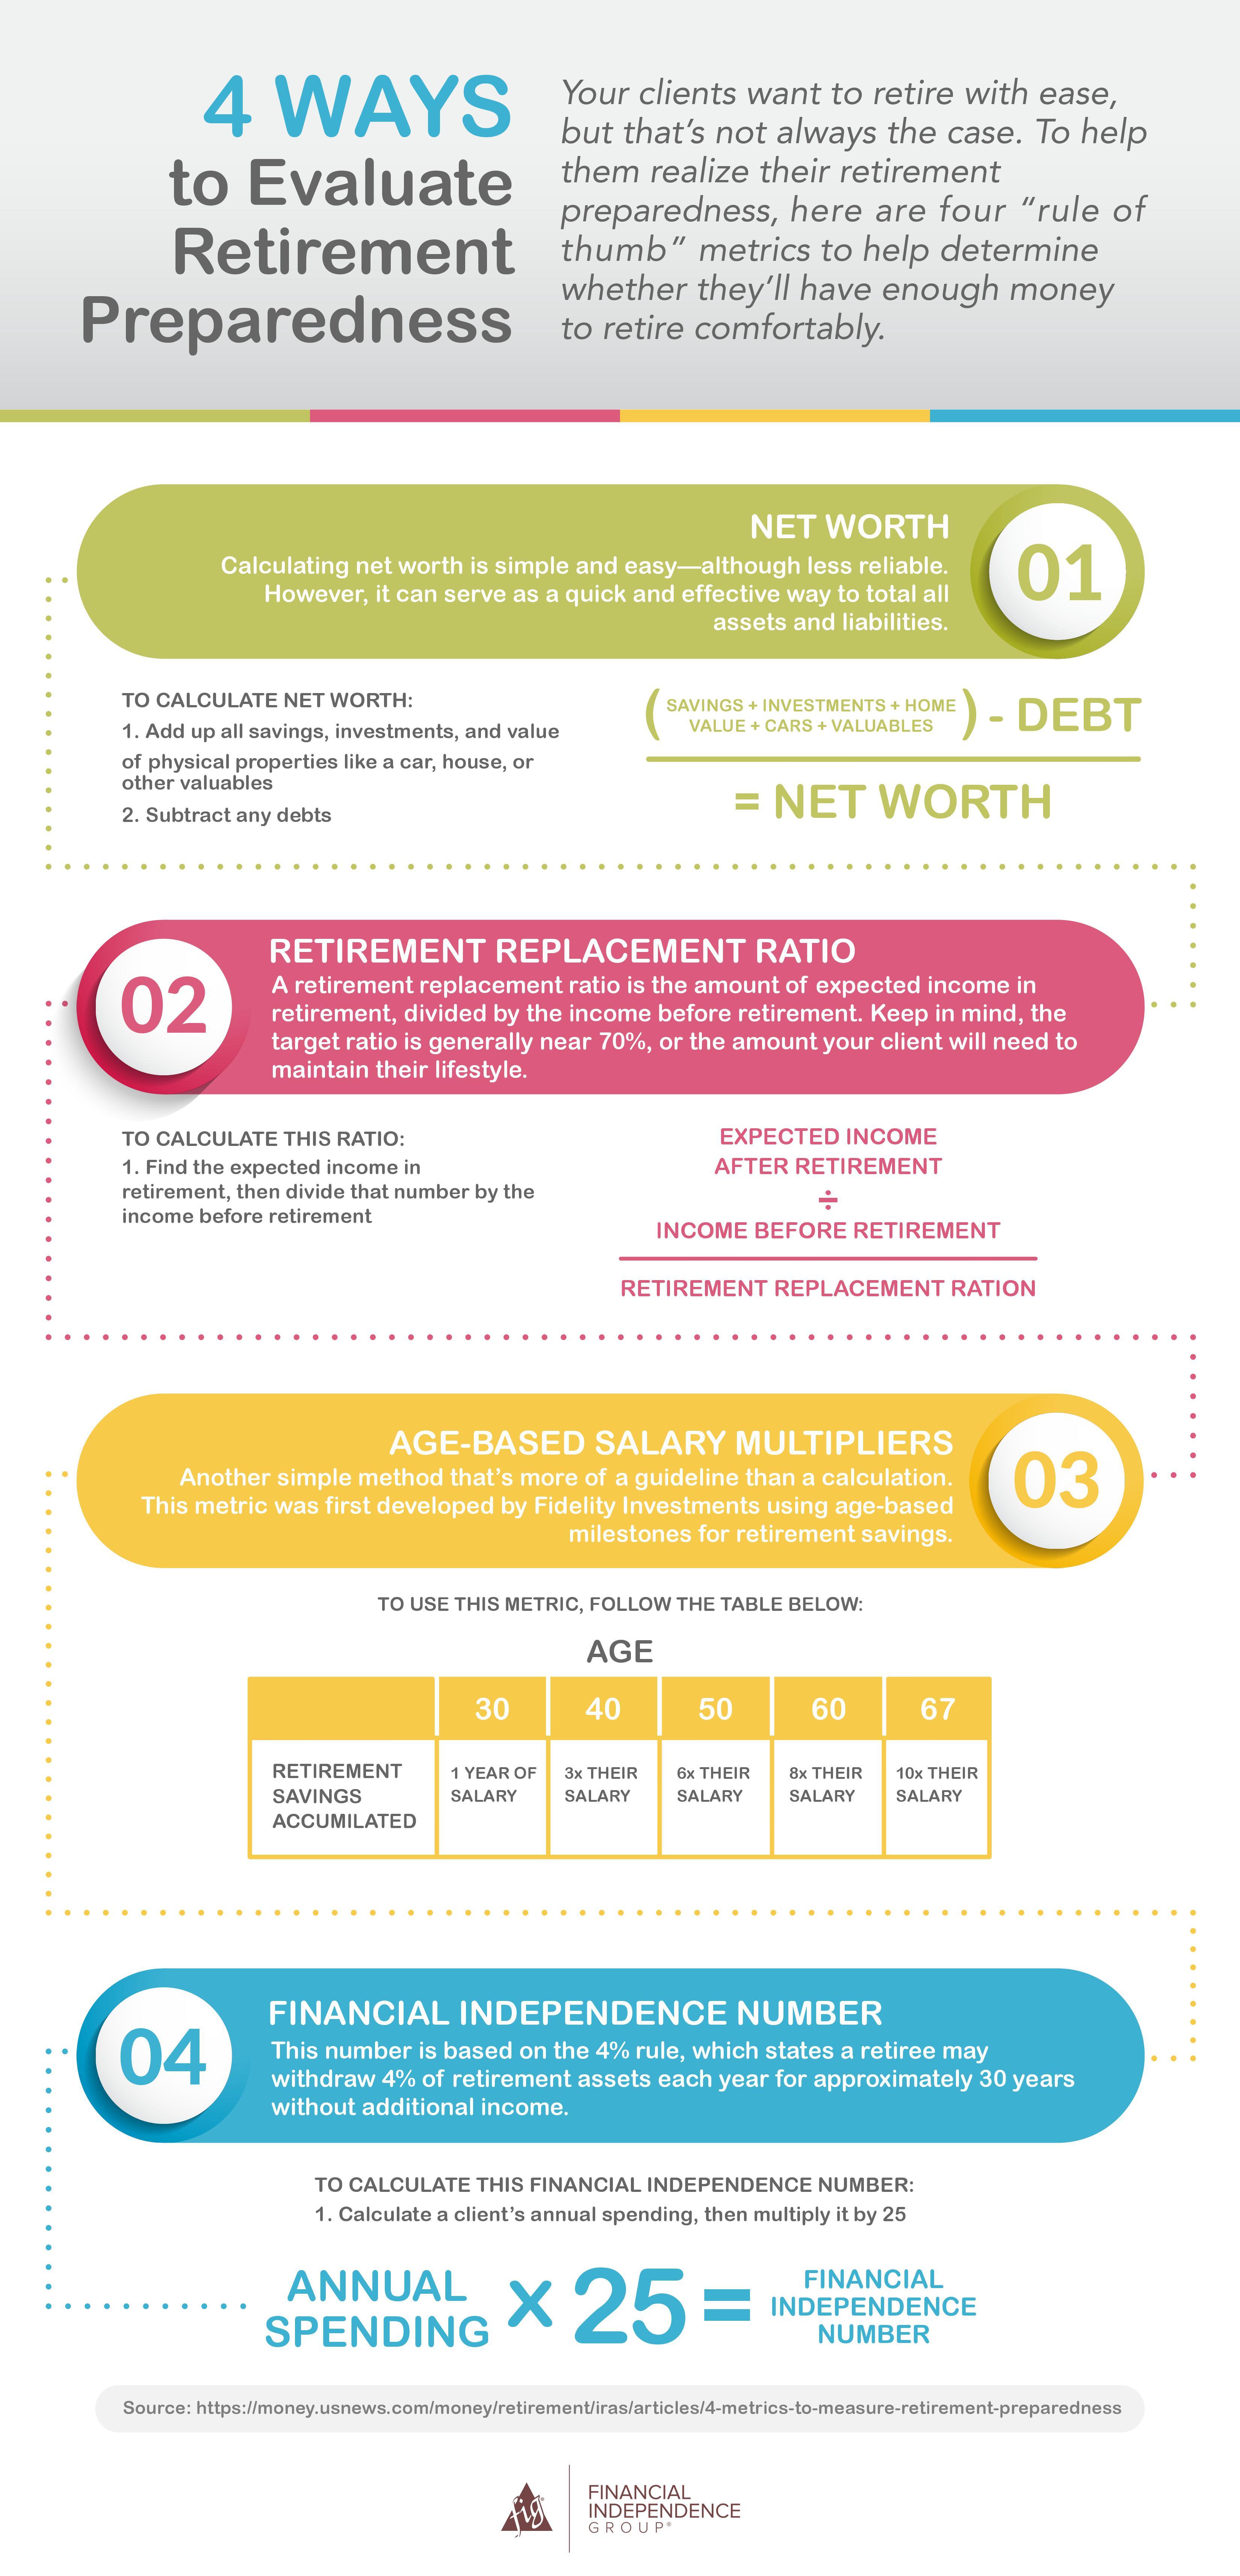 4 ways to evaluate retirement preparedness infographic